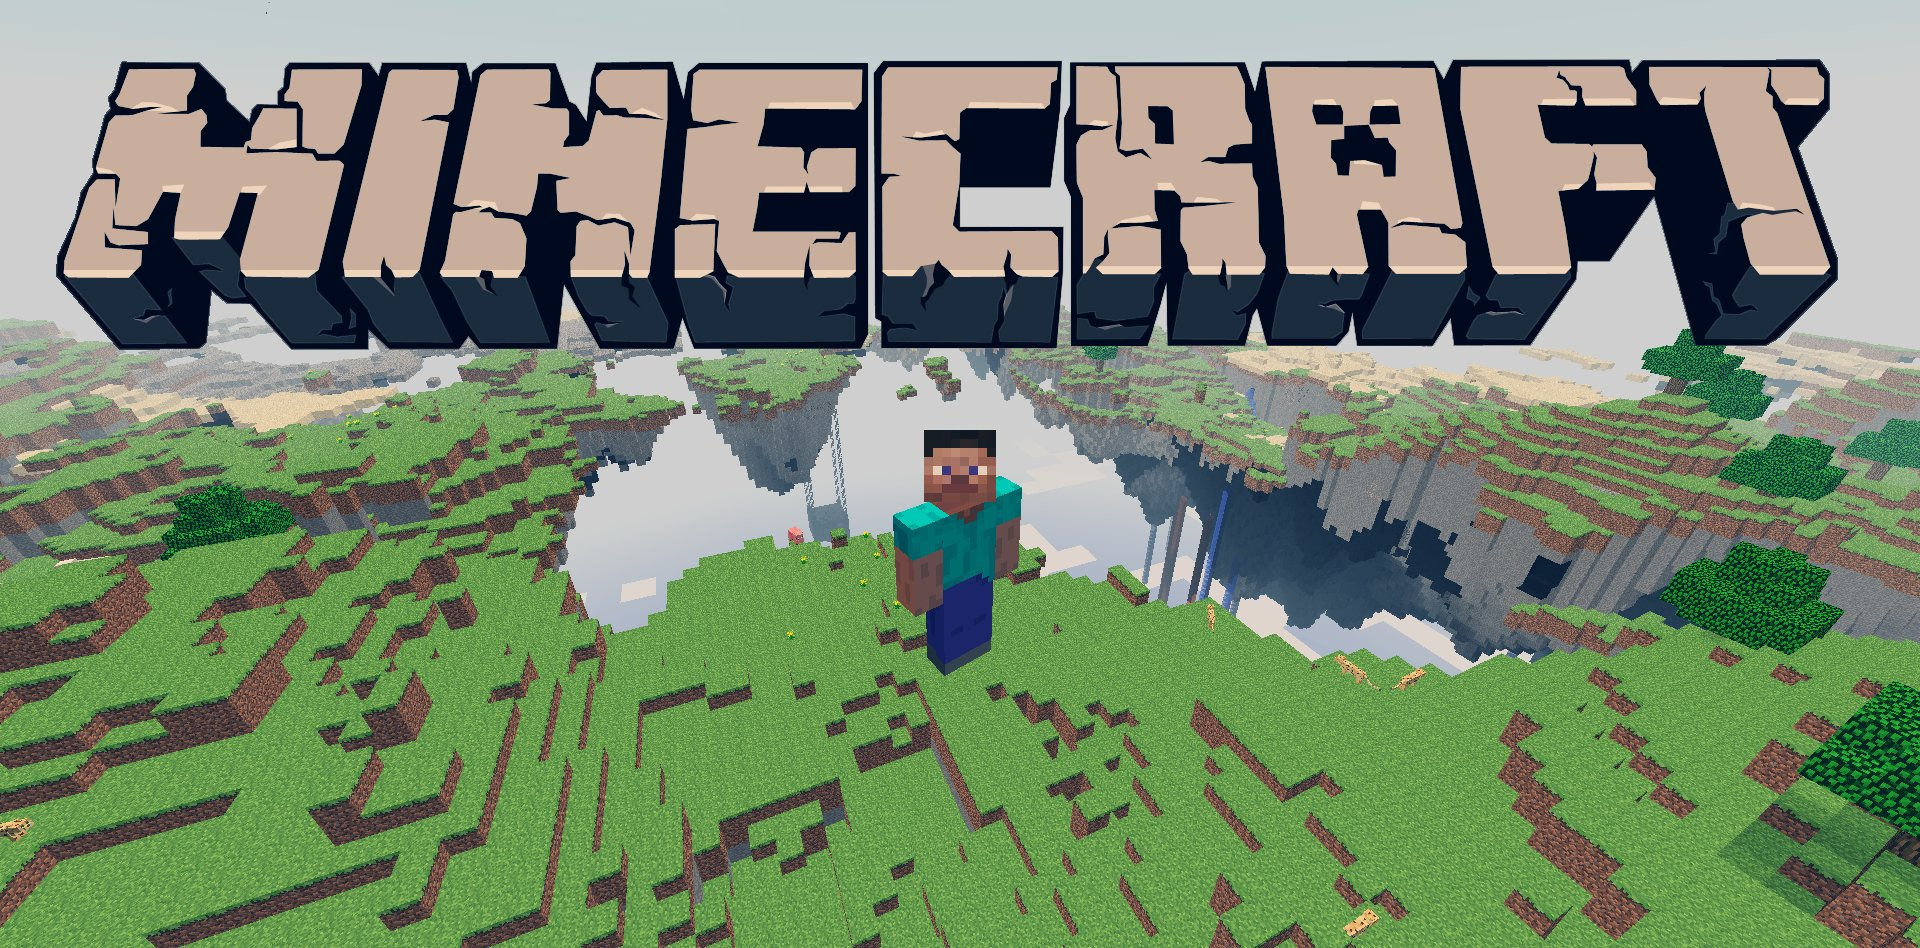 Best Wallpaper Minecraft Quote - 477060  Trends_1002953.jpg